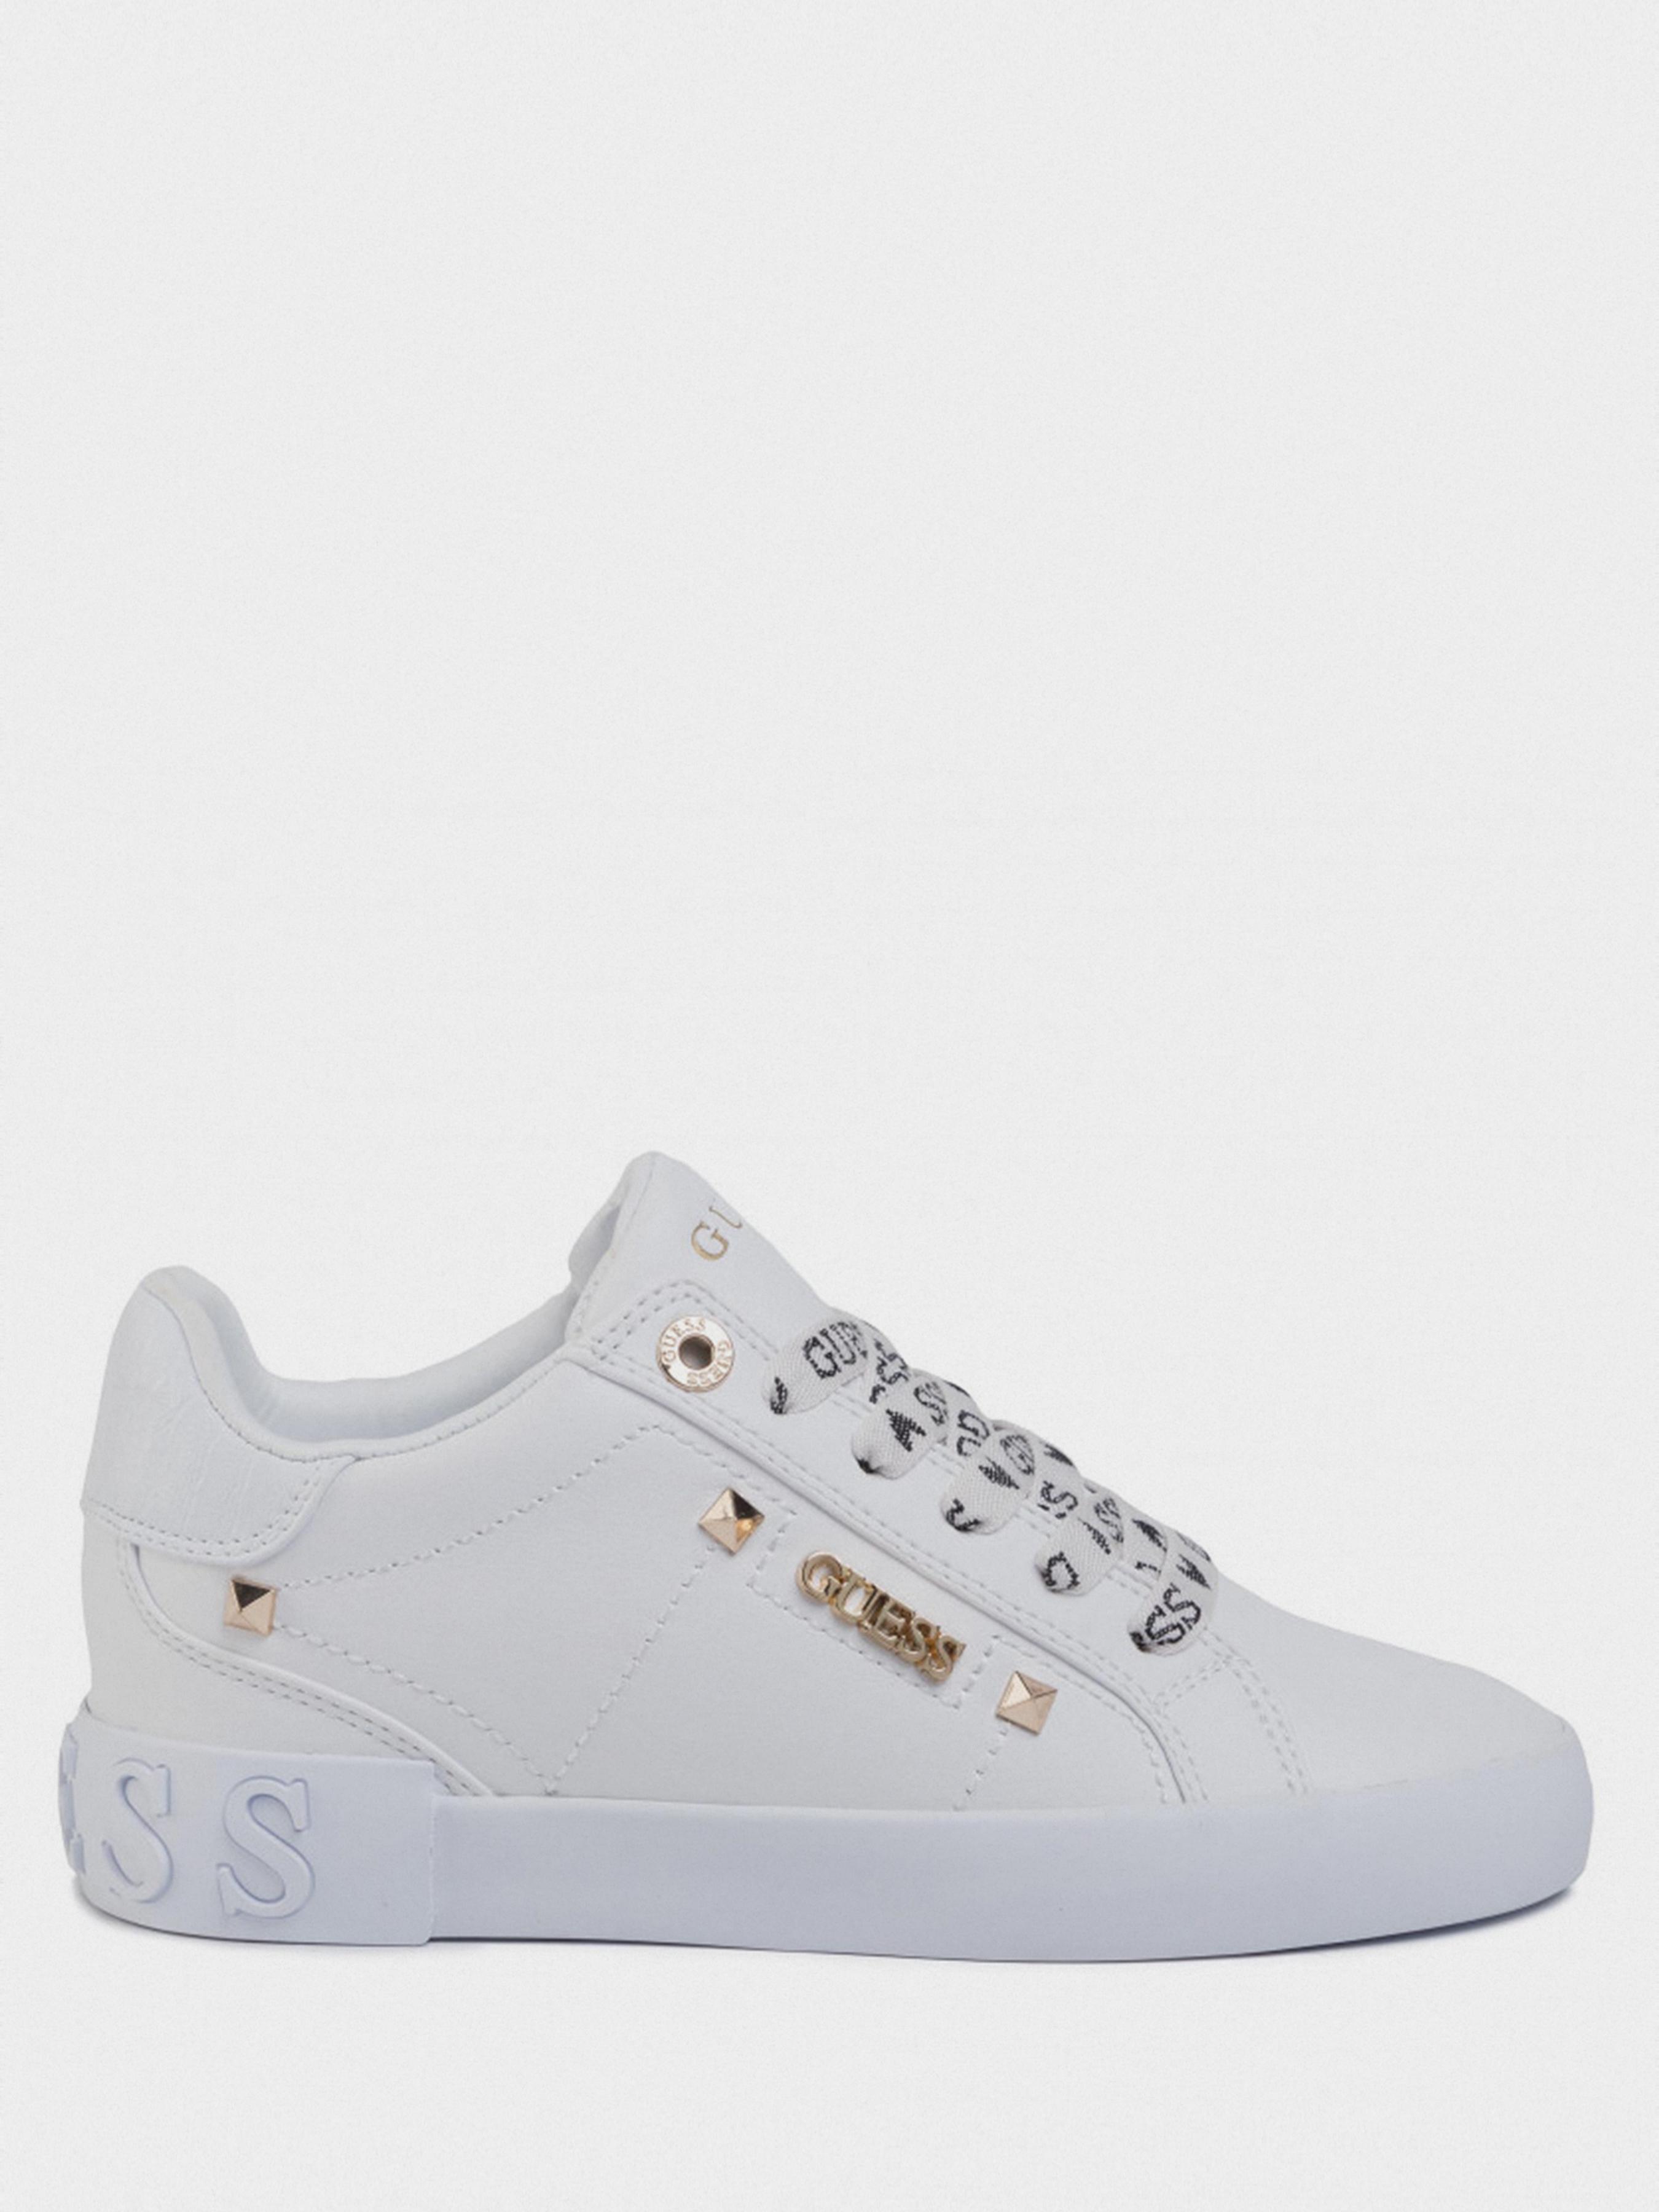 Купить Кеды женские GUESS FL5PUX-LEA12-WHITE, Белый